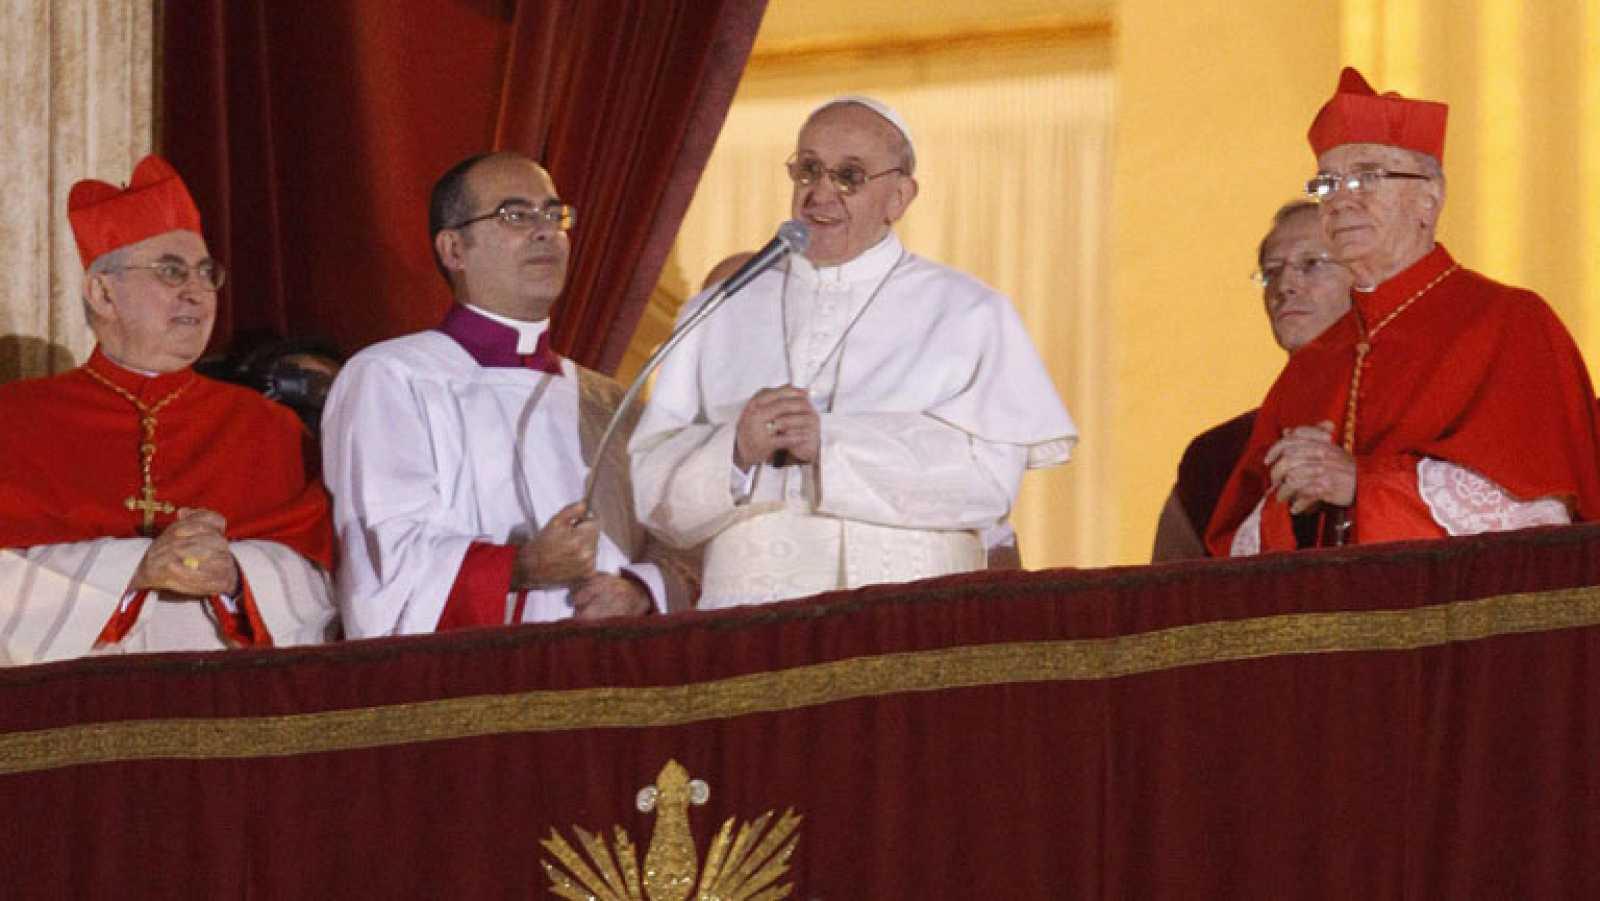 Bergolio un Papa diferente